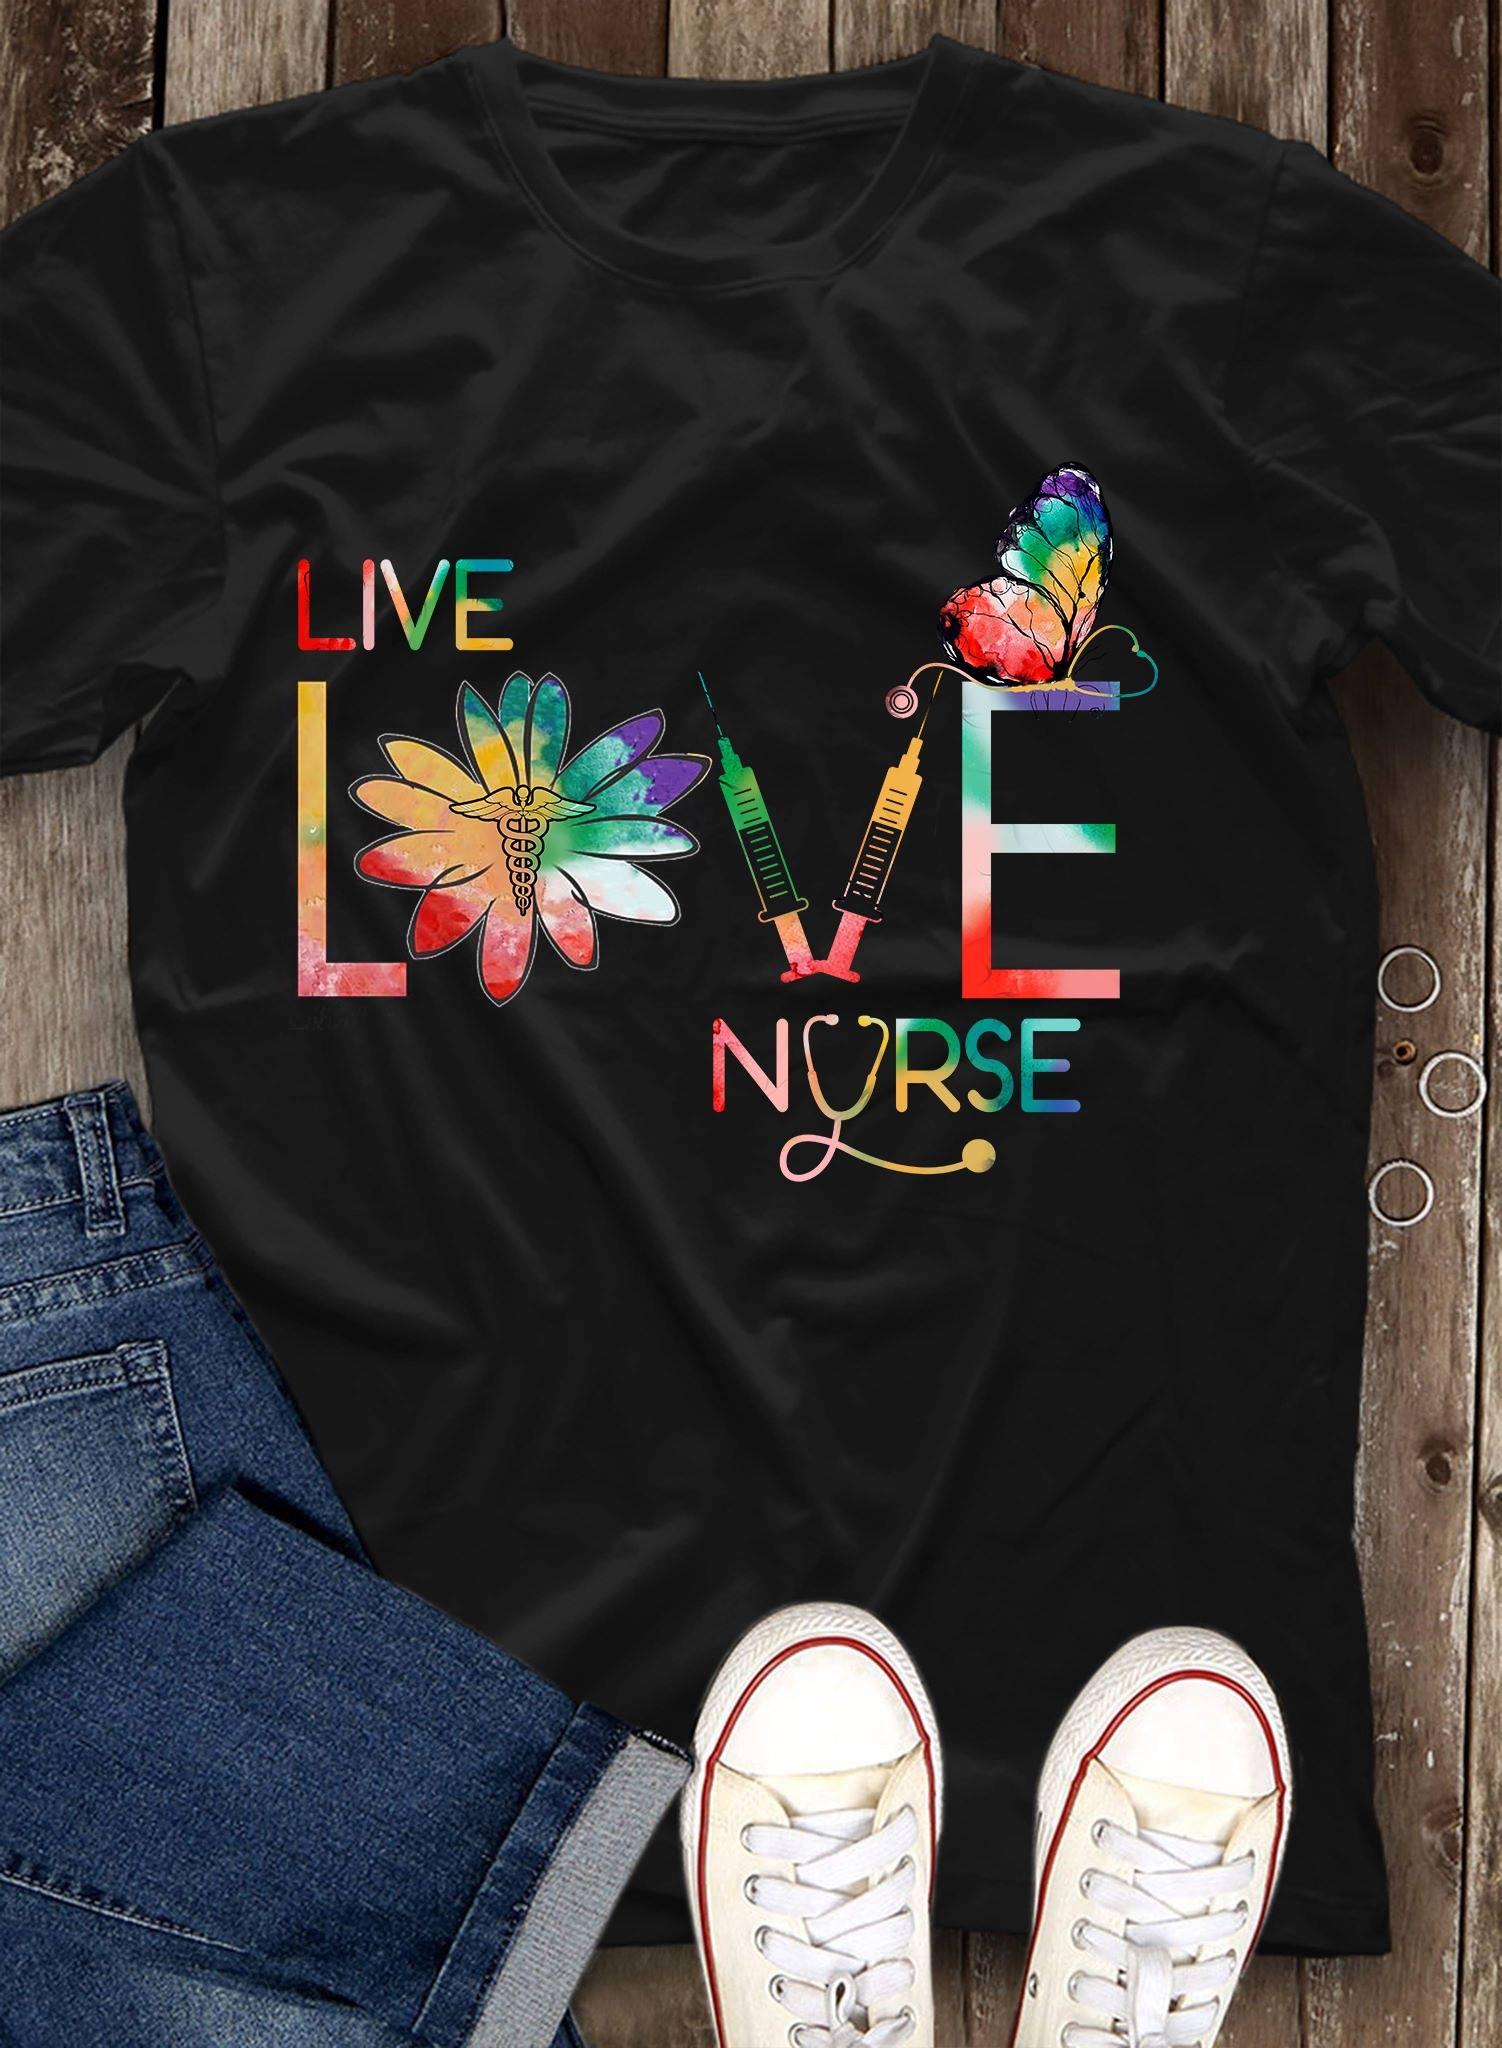 Nurse Shirt Live Love Nurse Butterfly Caduceus